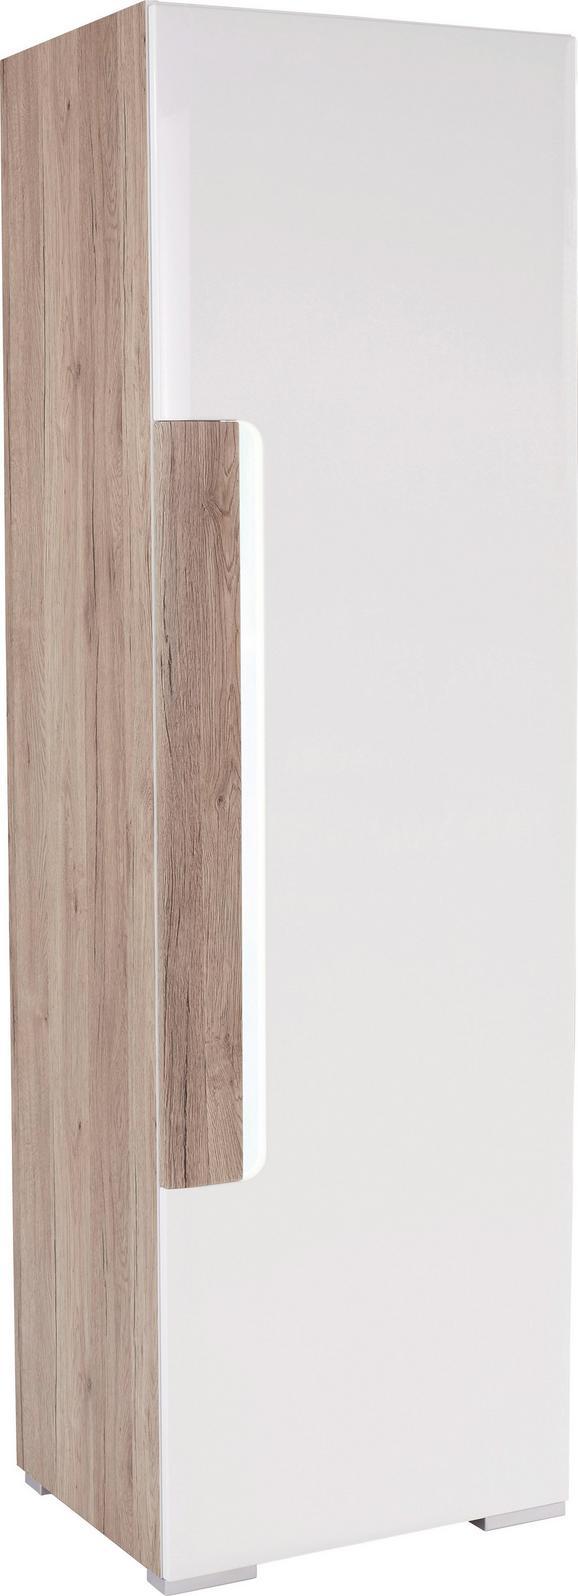 Omara Toronto - bela/hrast, Moderno, leseni material (57,9/196/42,2cm) - MÖMAX modern living